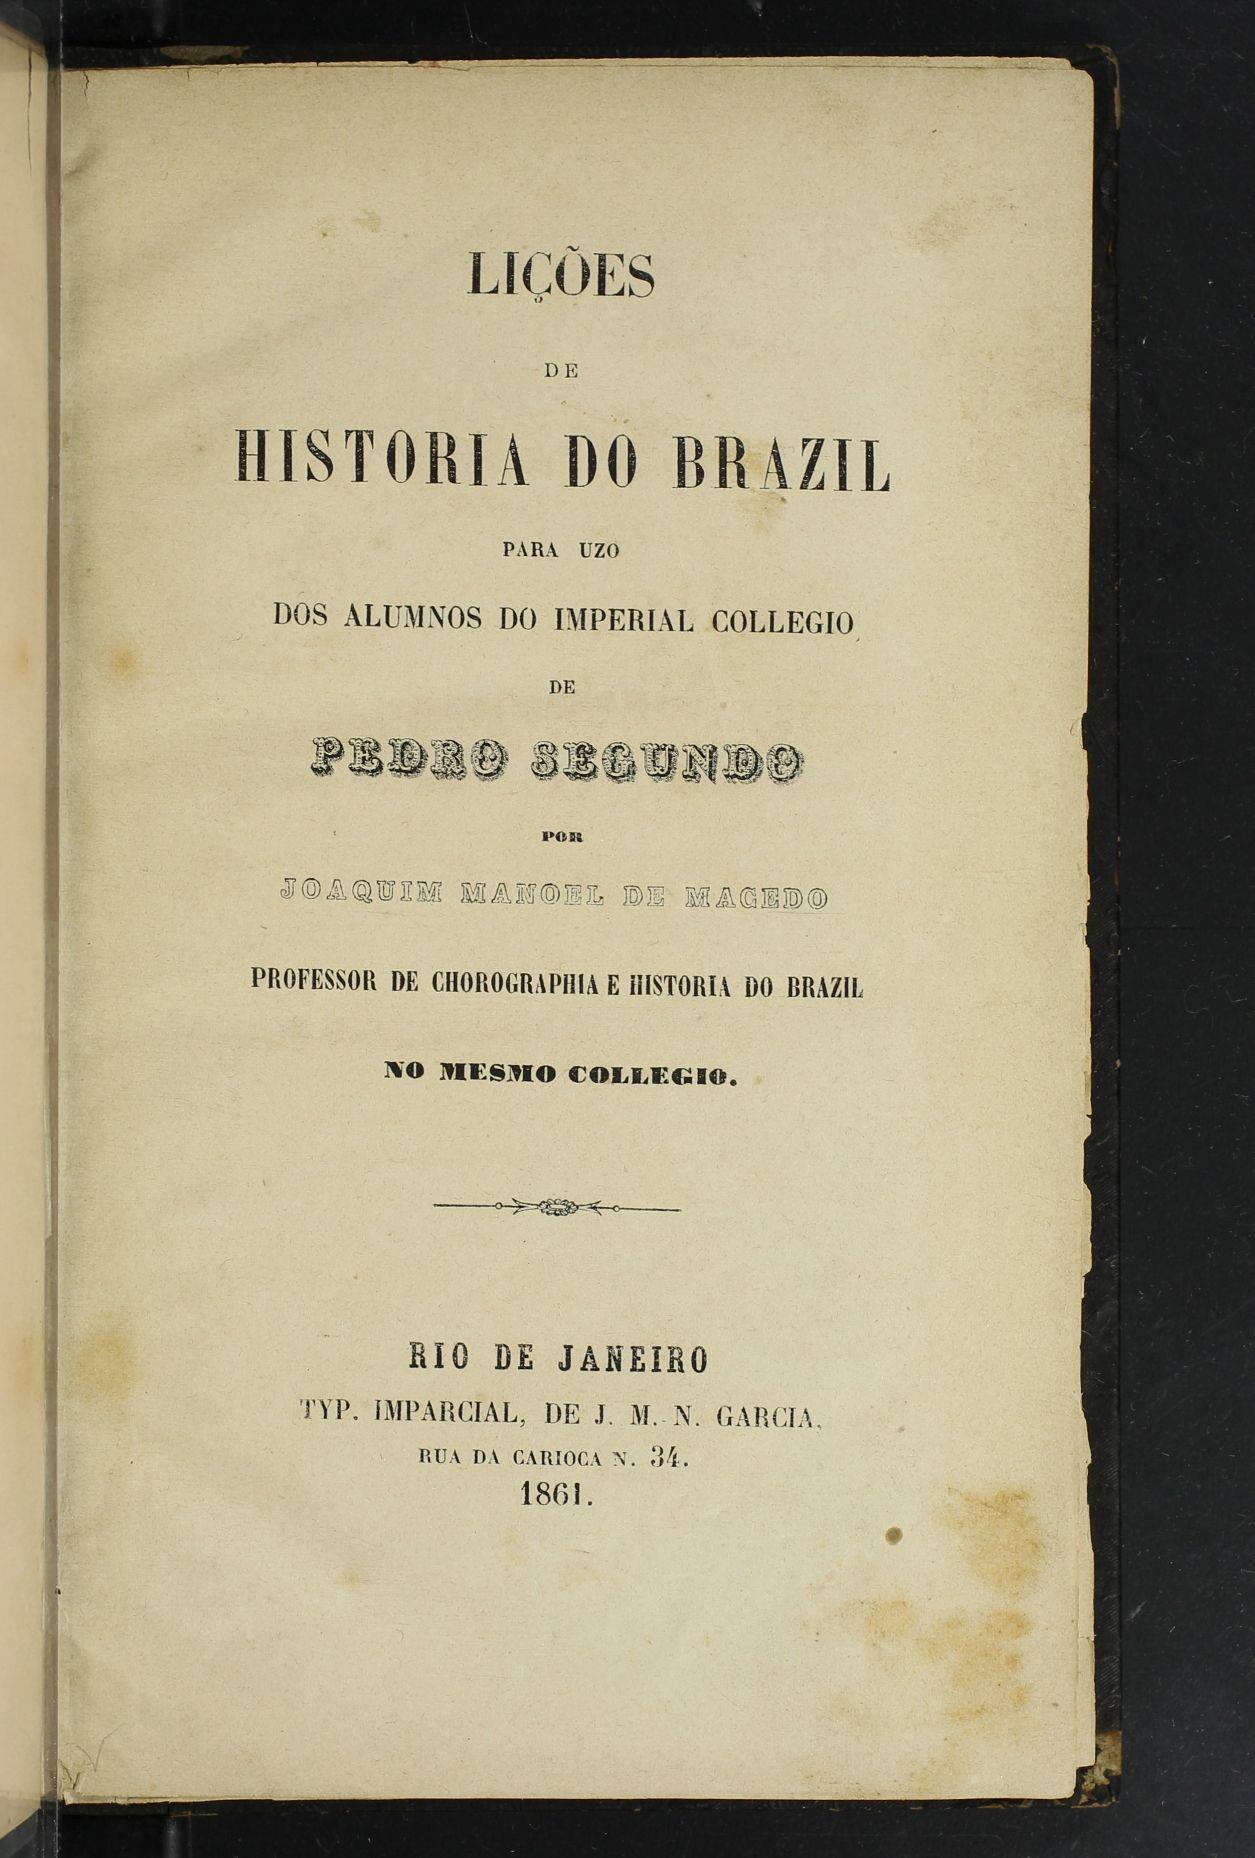 Biblioteca Brasiliana Guita e José Mindlin: Acervo Digital